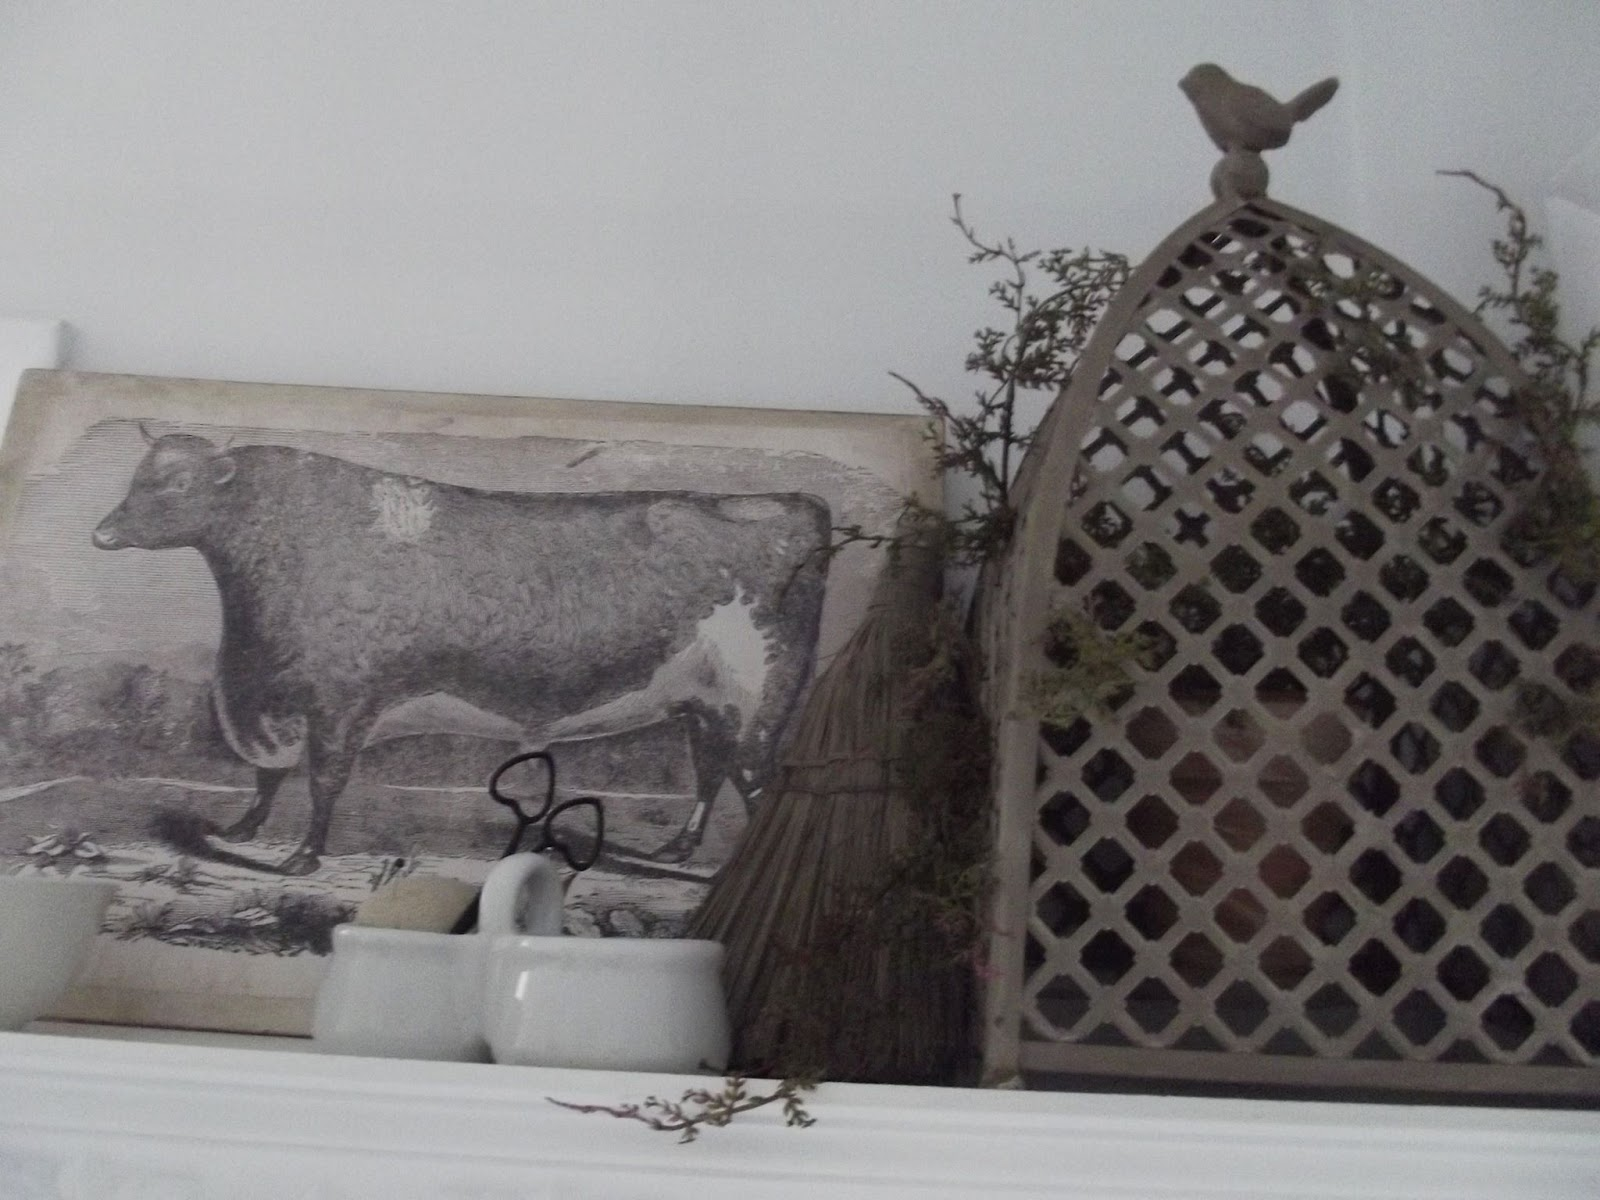 The Sampler Maker s Farmhouse Primitive Vintage Farmhouse Decor